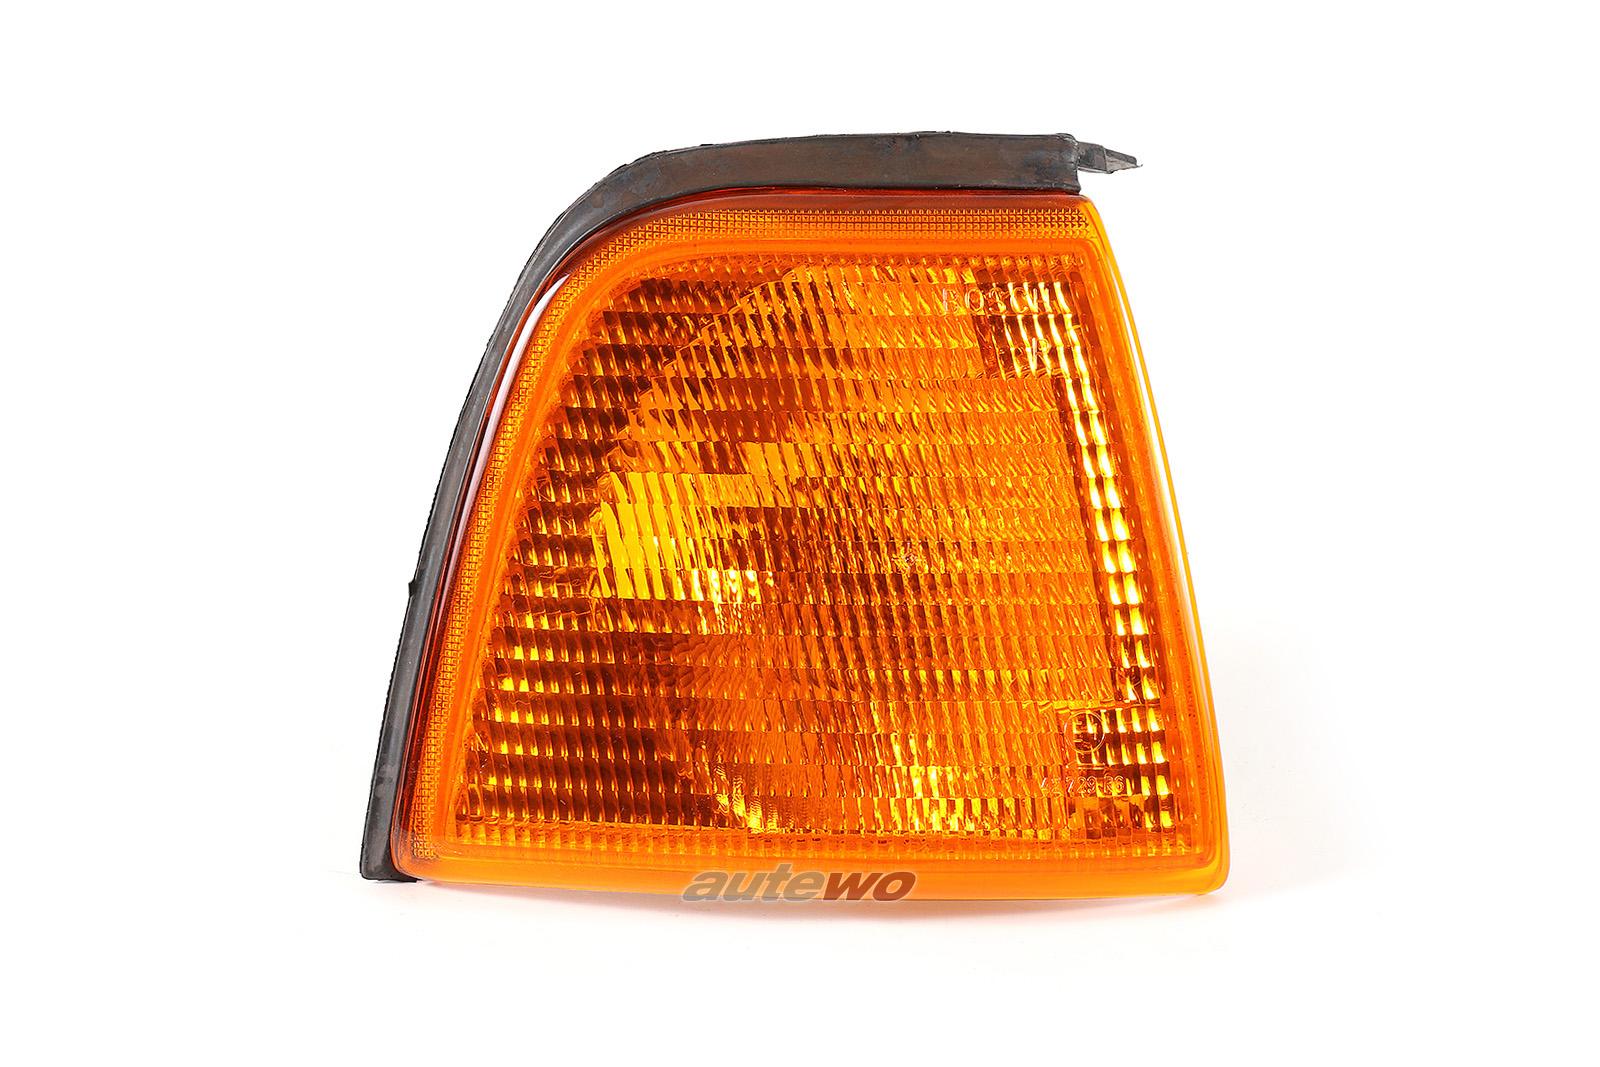 893953050 NEU Audi 80 Typ 89 Blinker Vorne Rechts orange